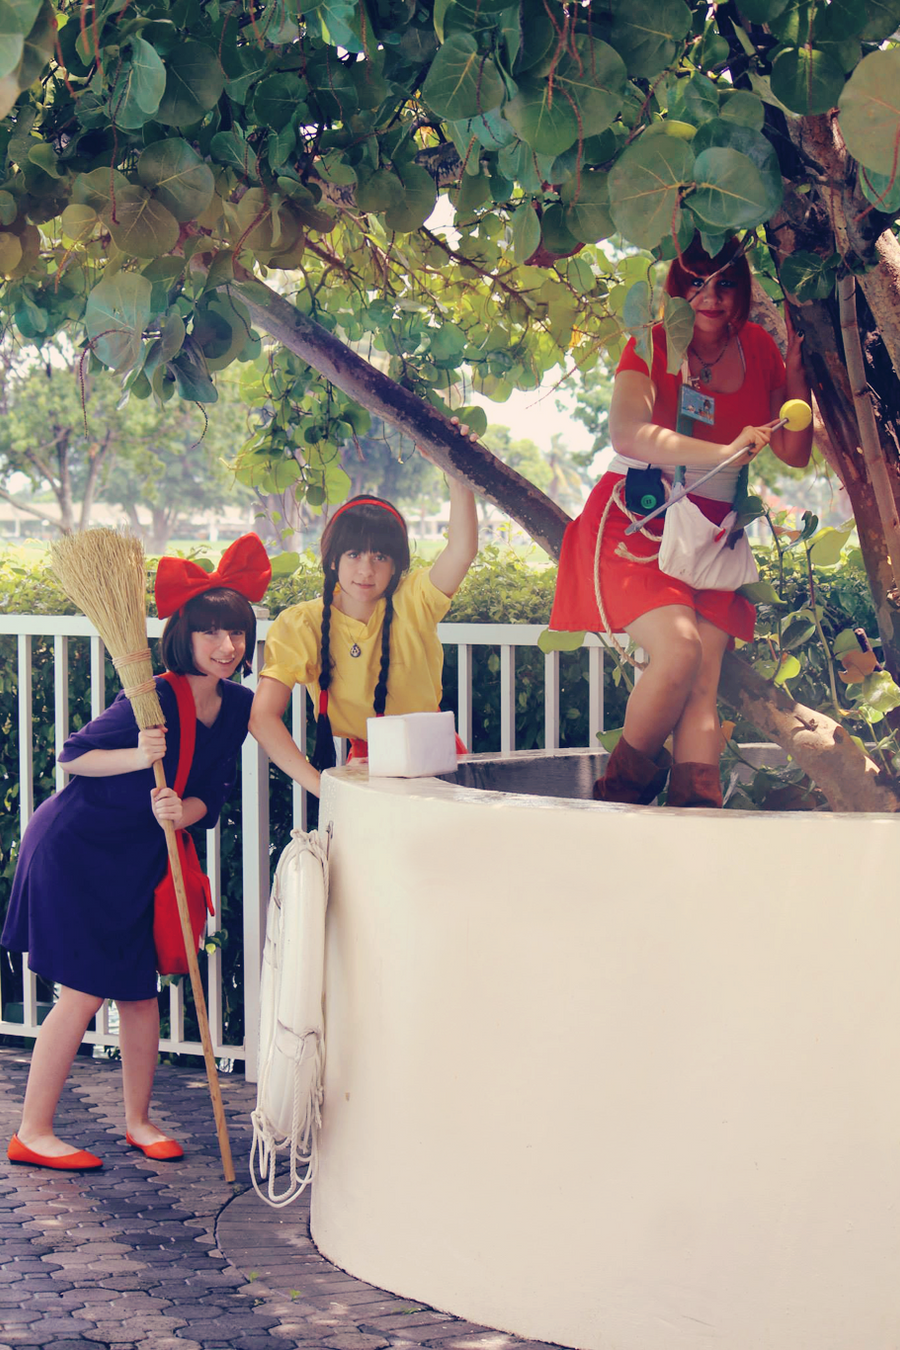 Studio Ghibli: Having Fun by SAYA-LOURA